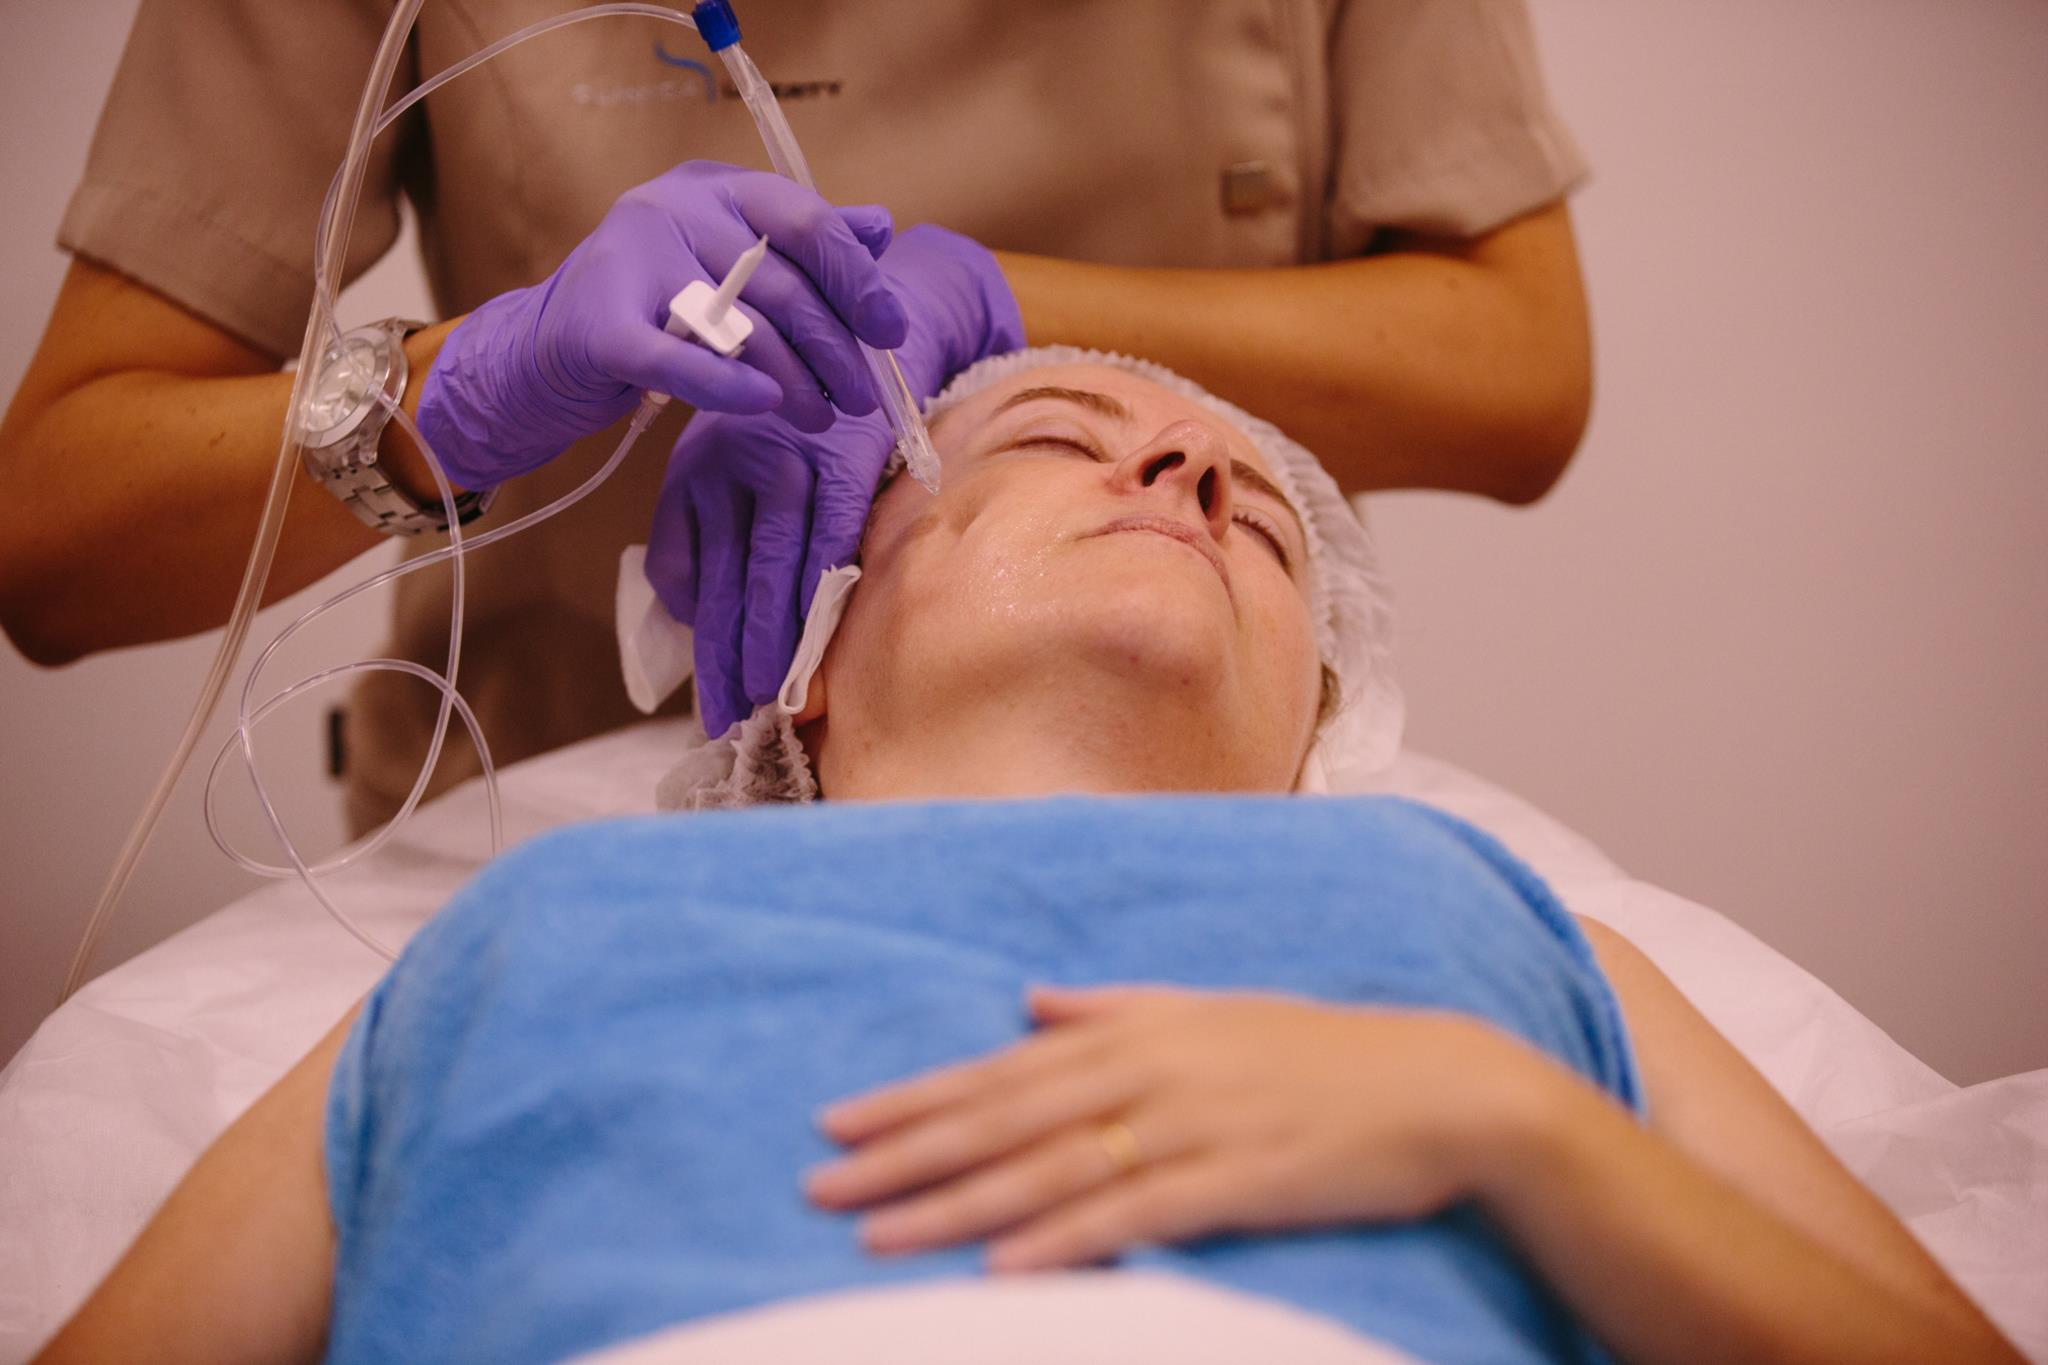 Medicina estética: a seringa antes do bisturi